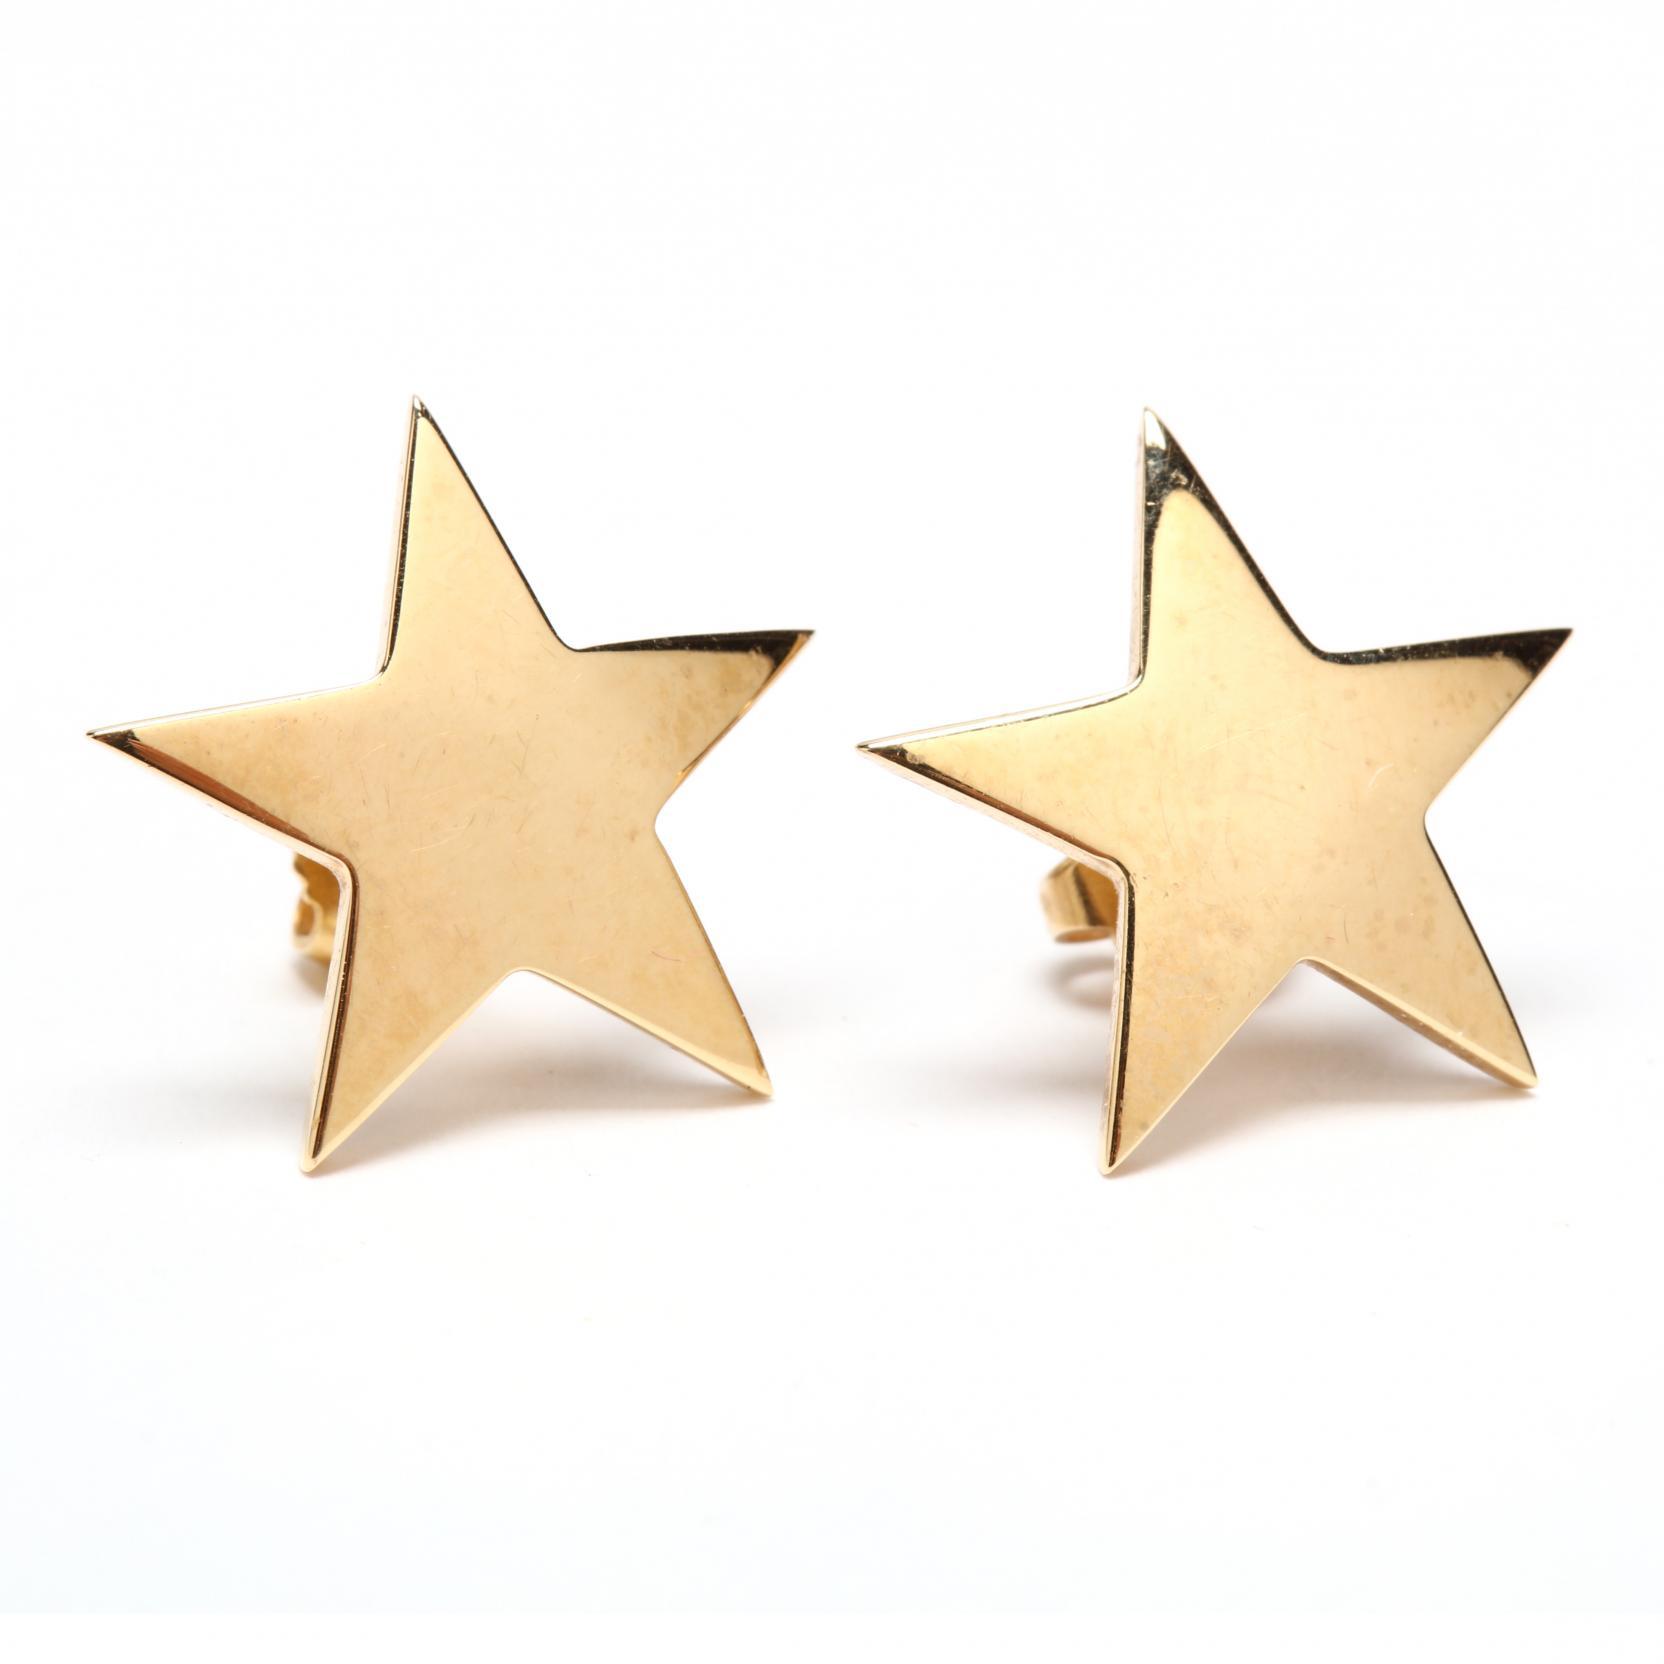 14kt-gold-star-stud-earrings